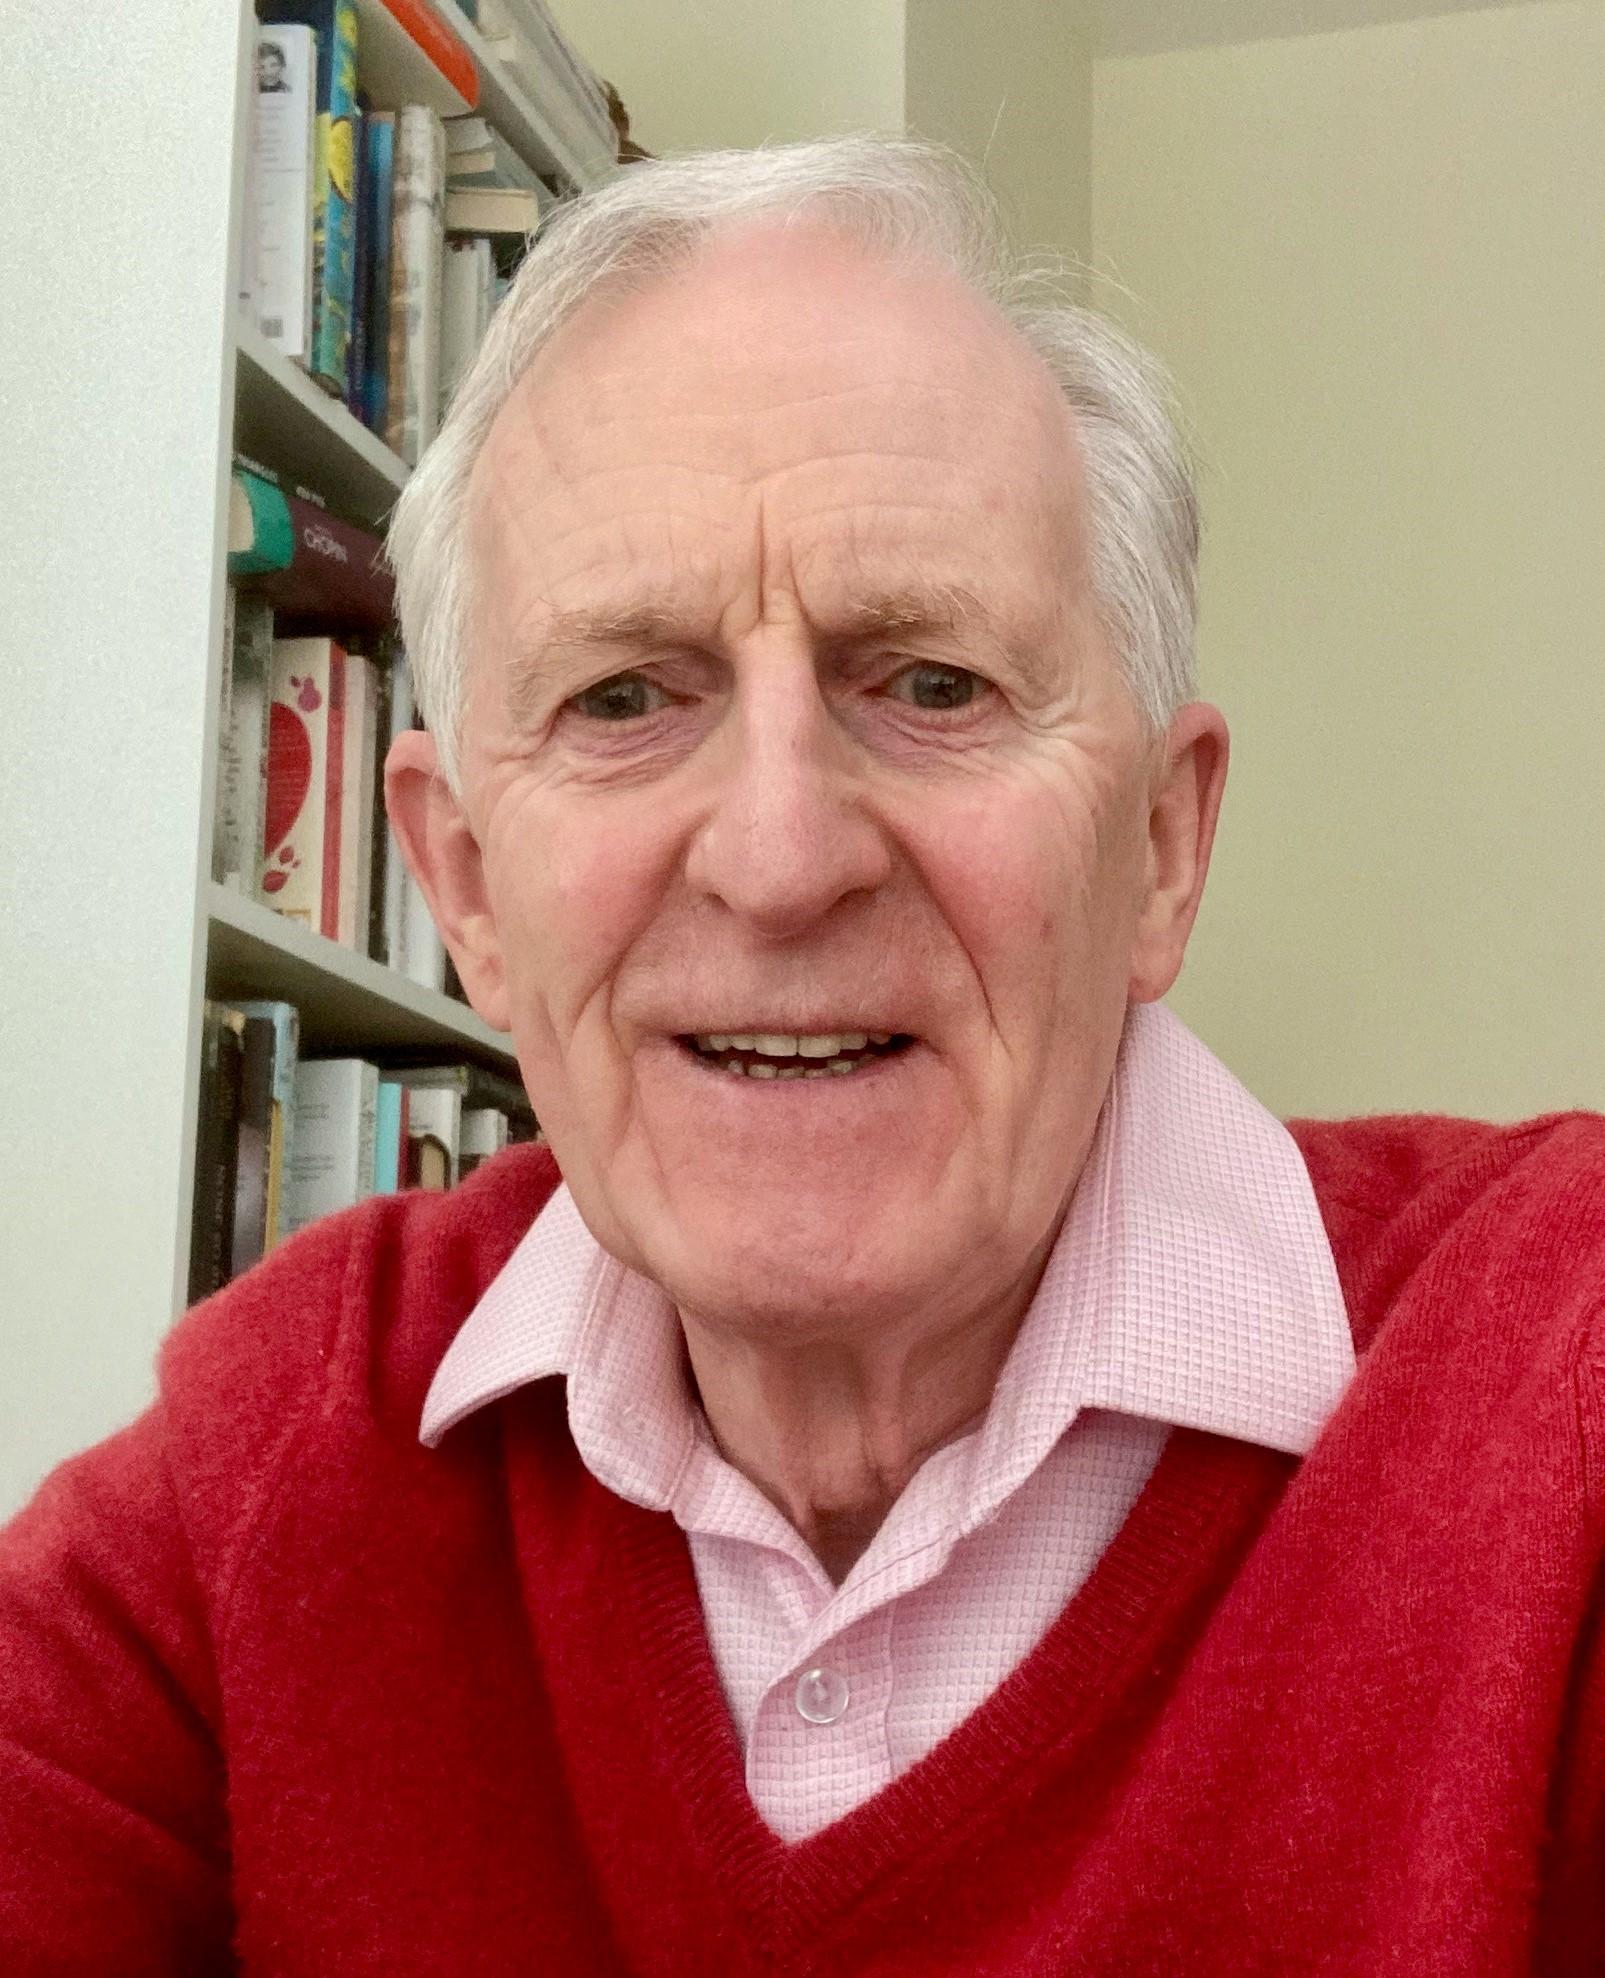 David Quarmby